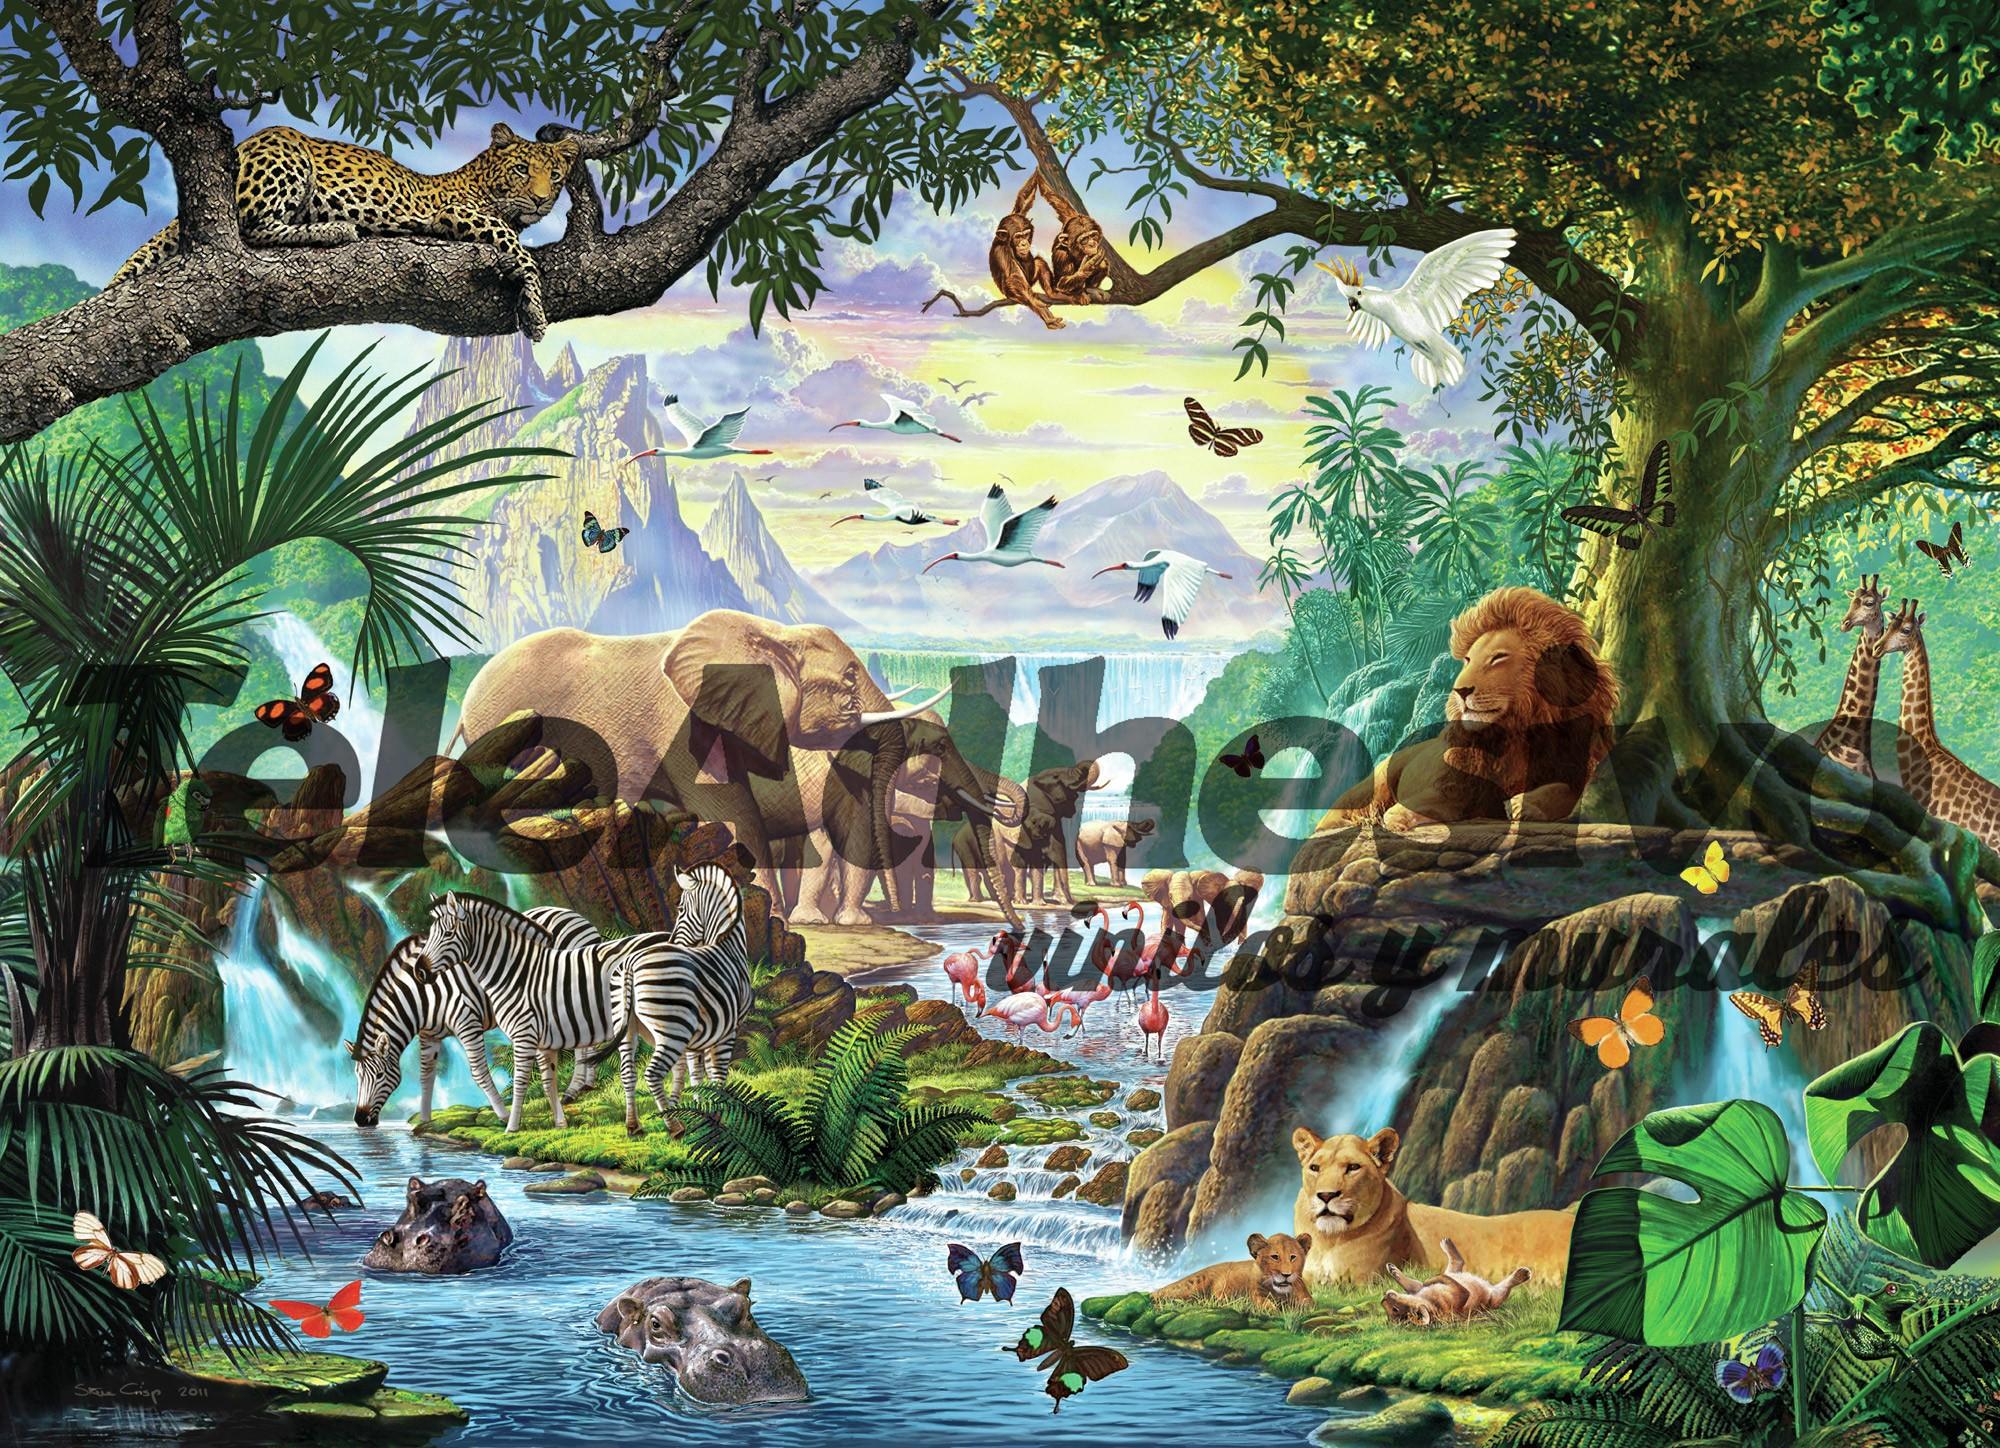 Fototapeten: Natur-Dschungel